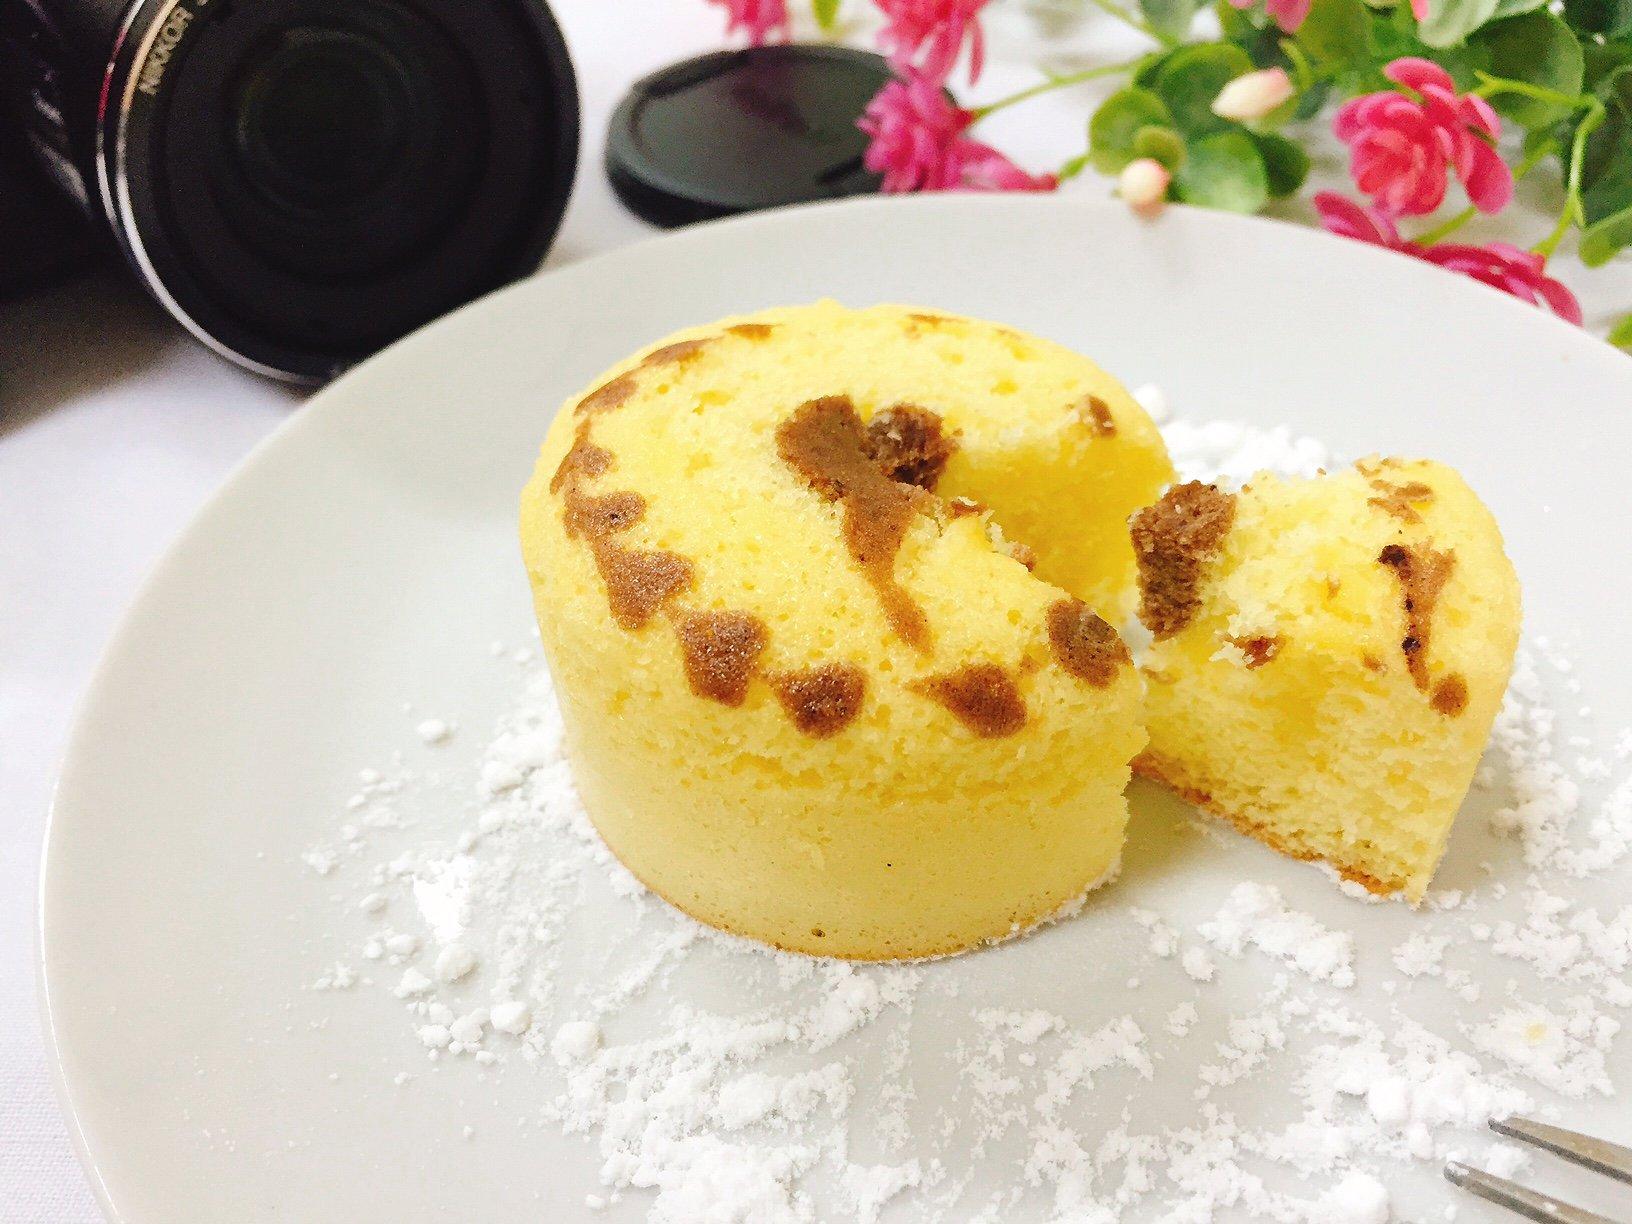 resep kue bolu sponge